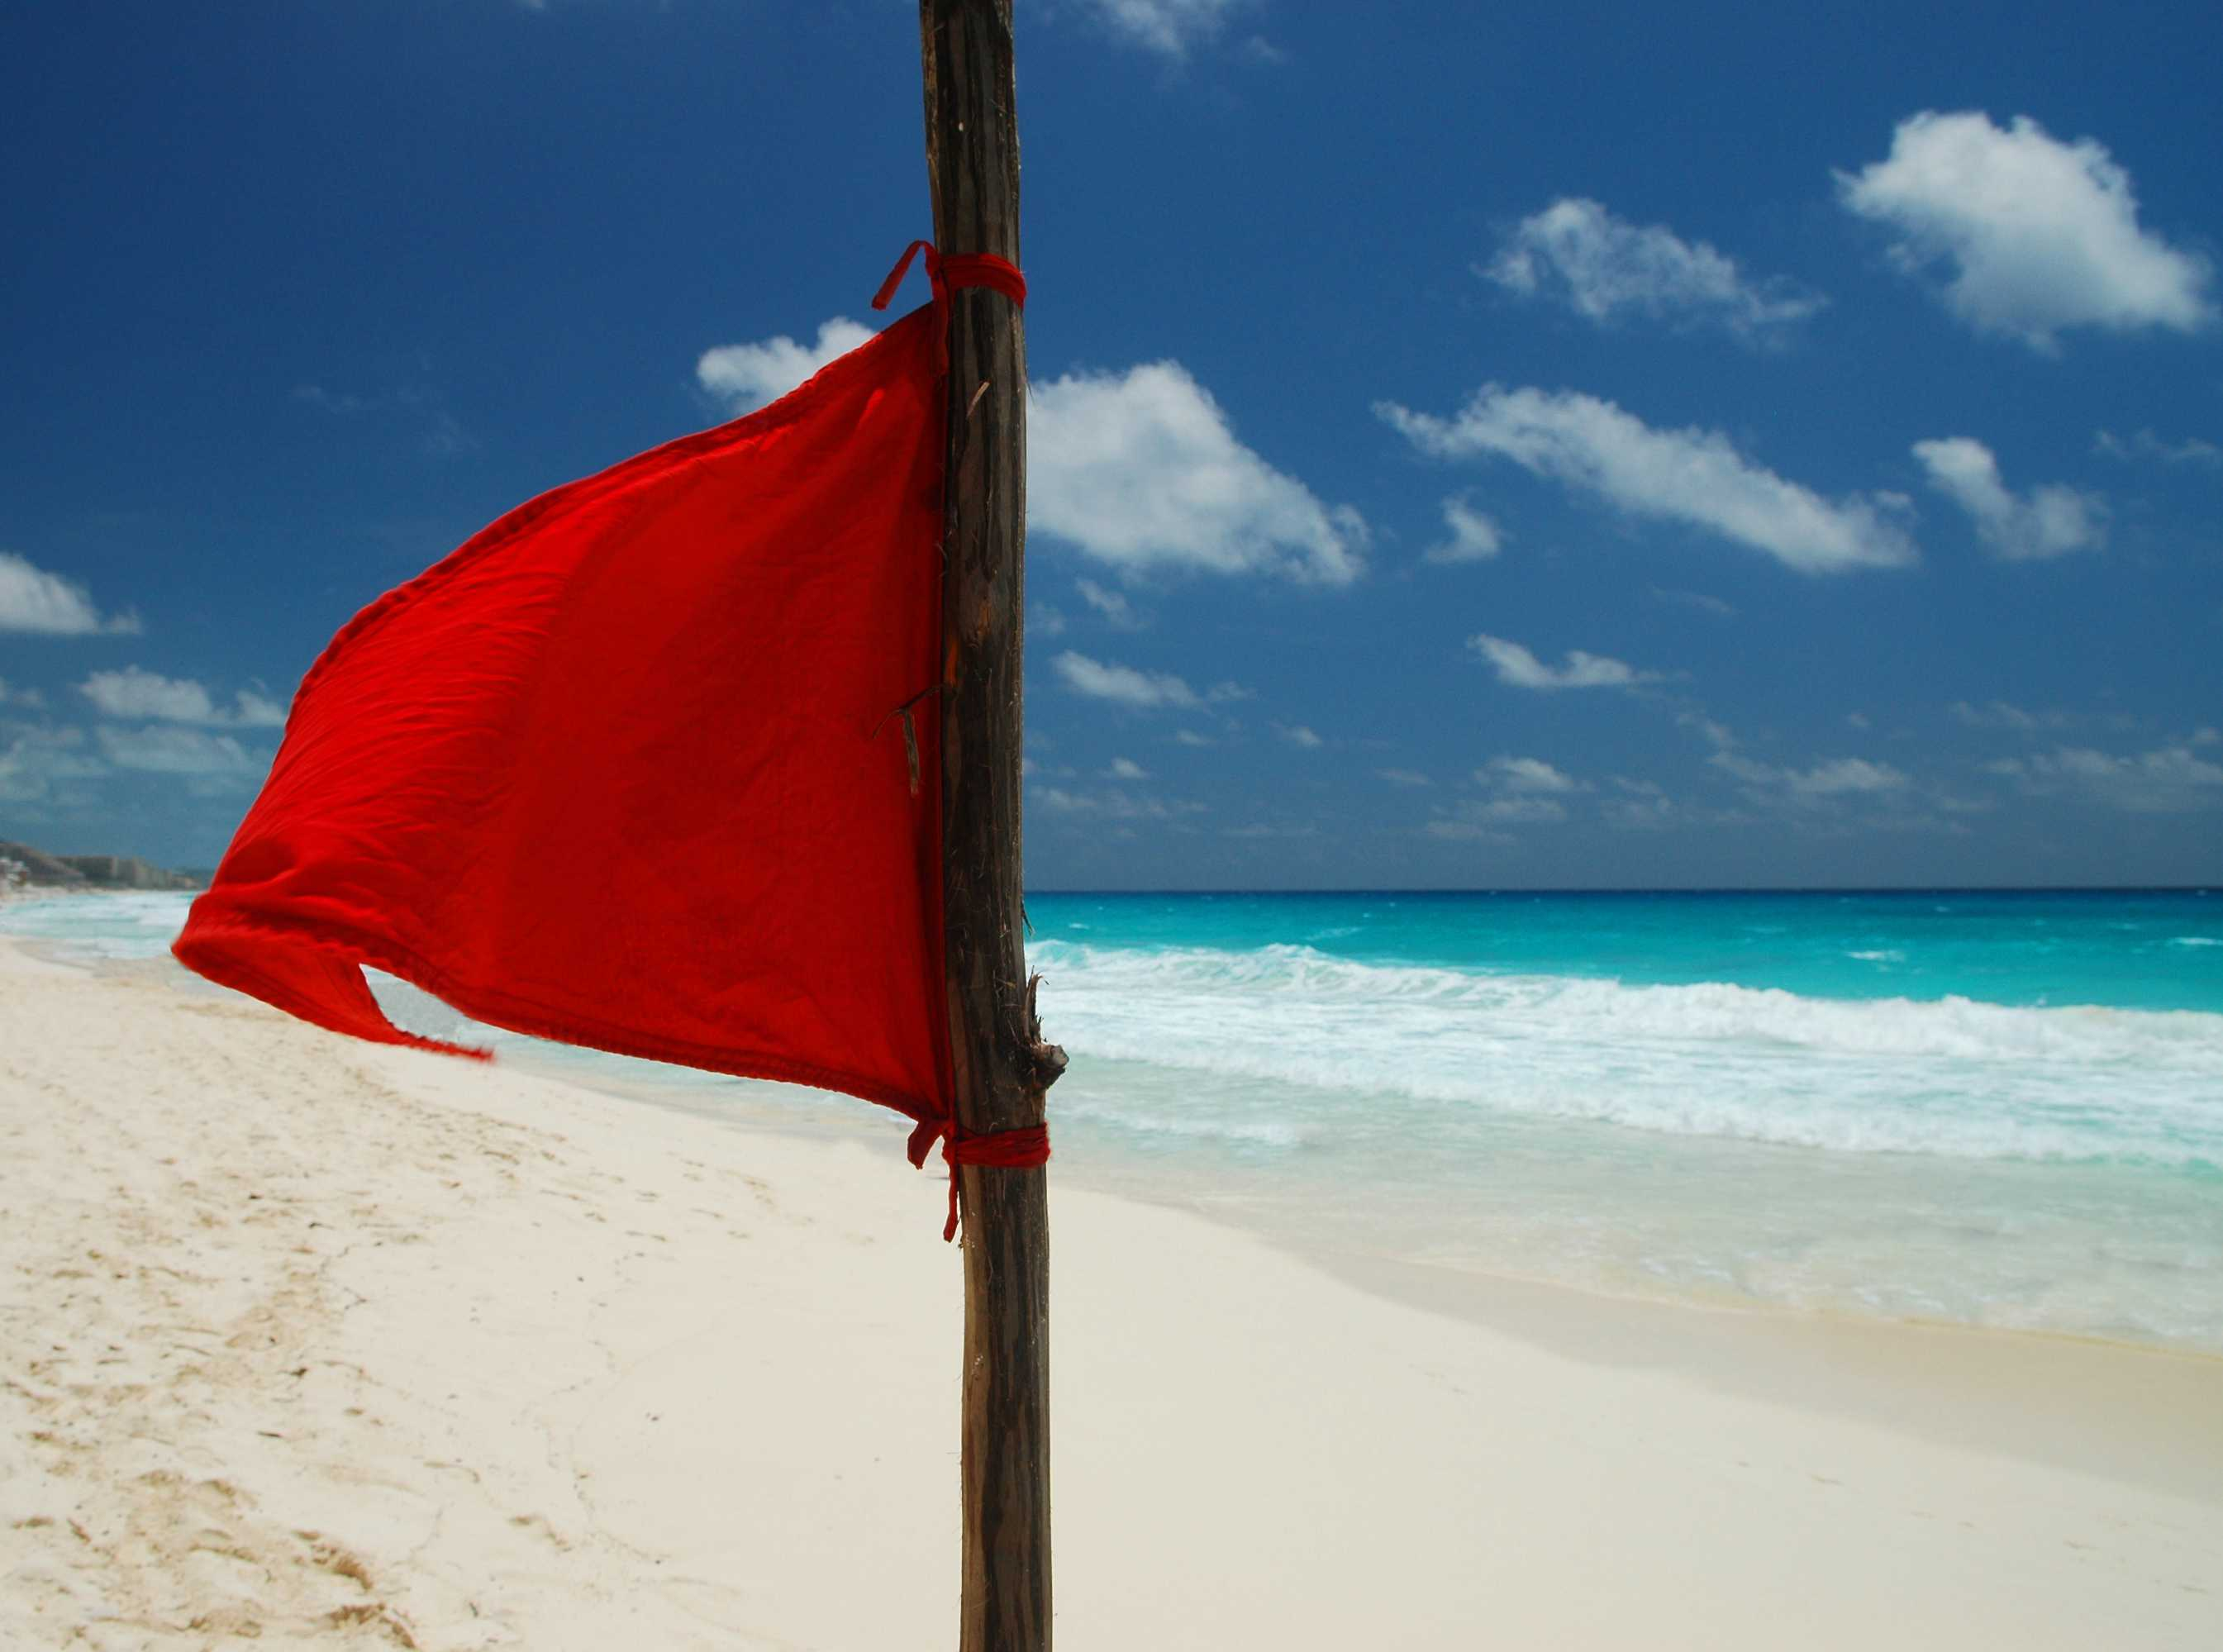 Big Red Flag